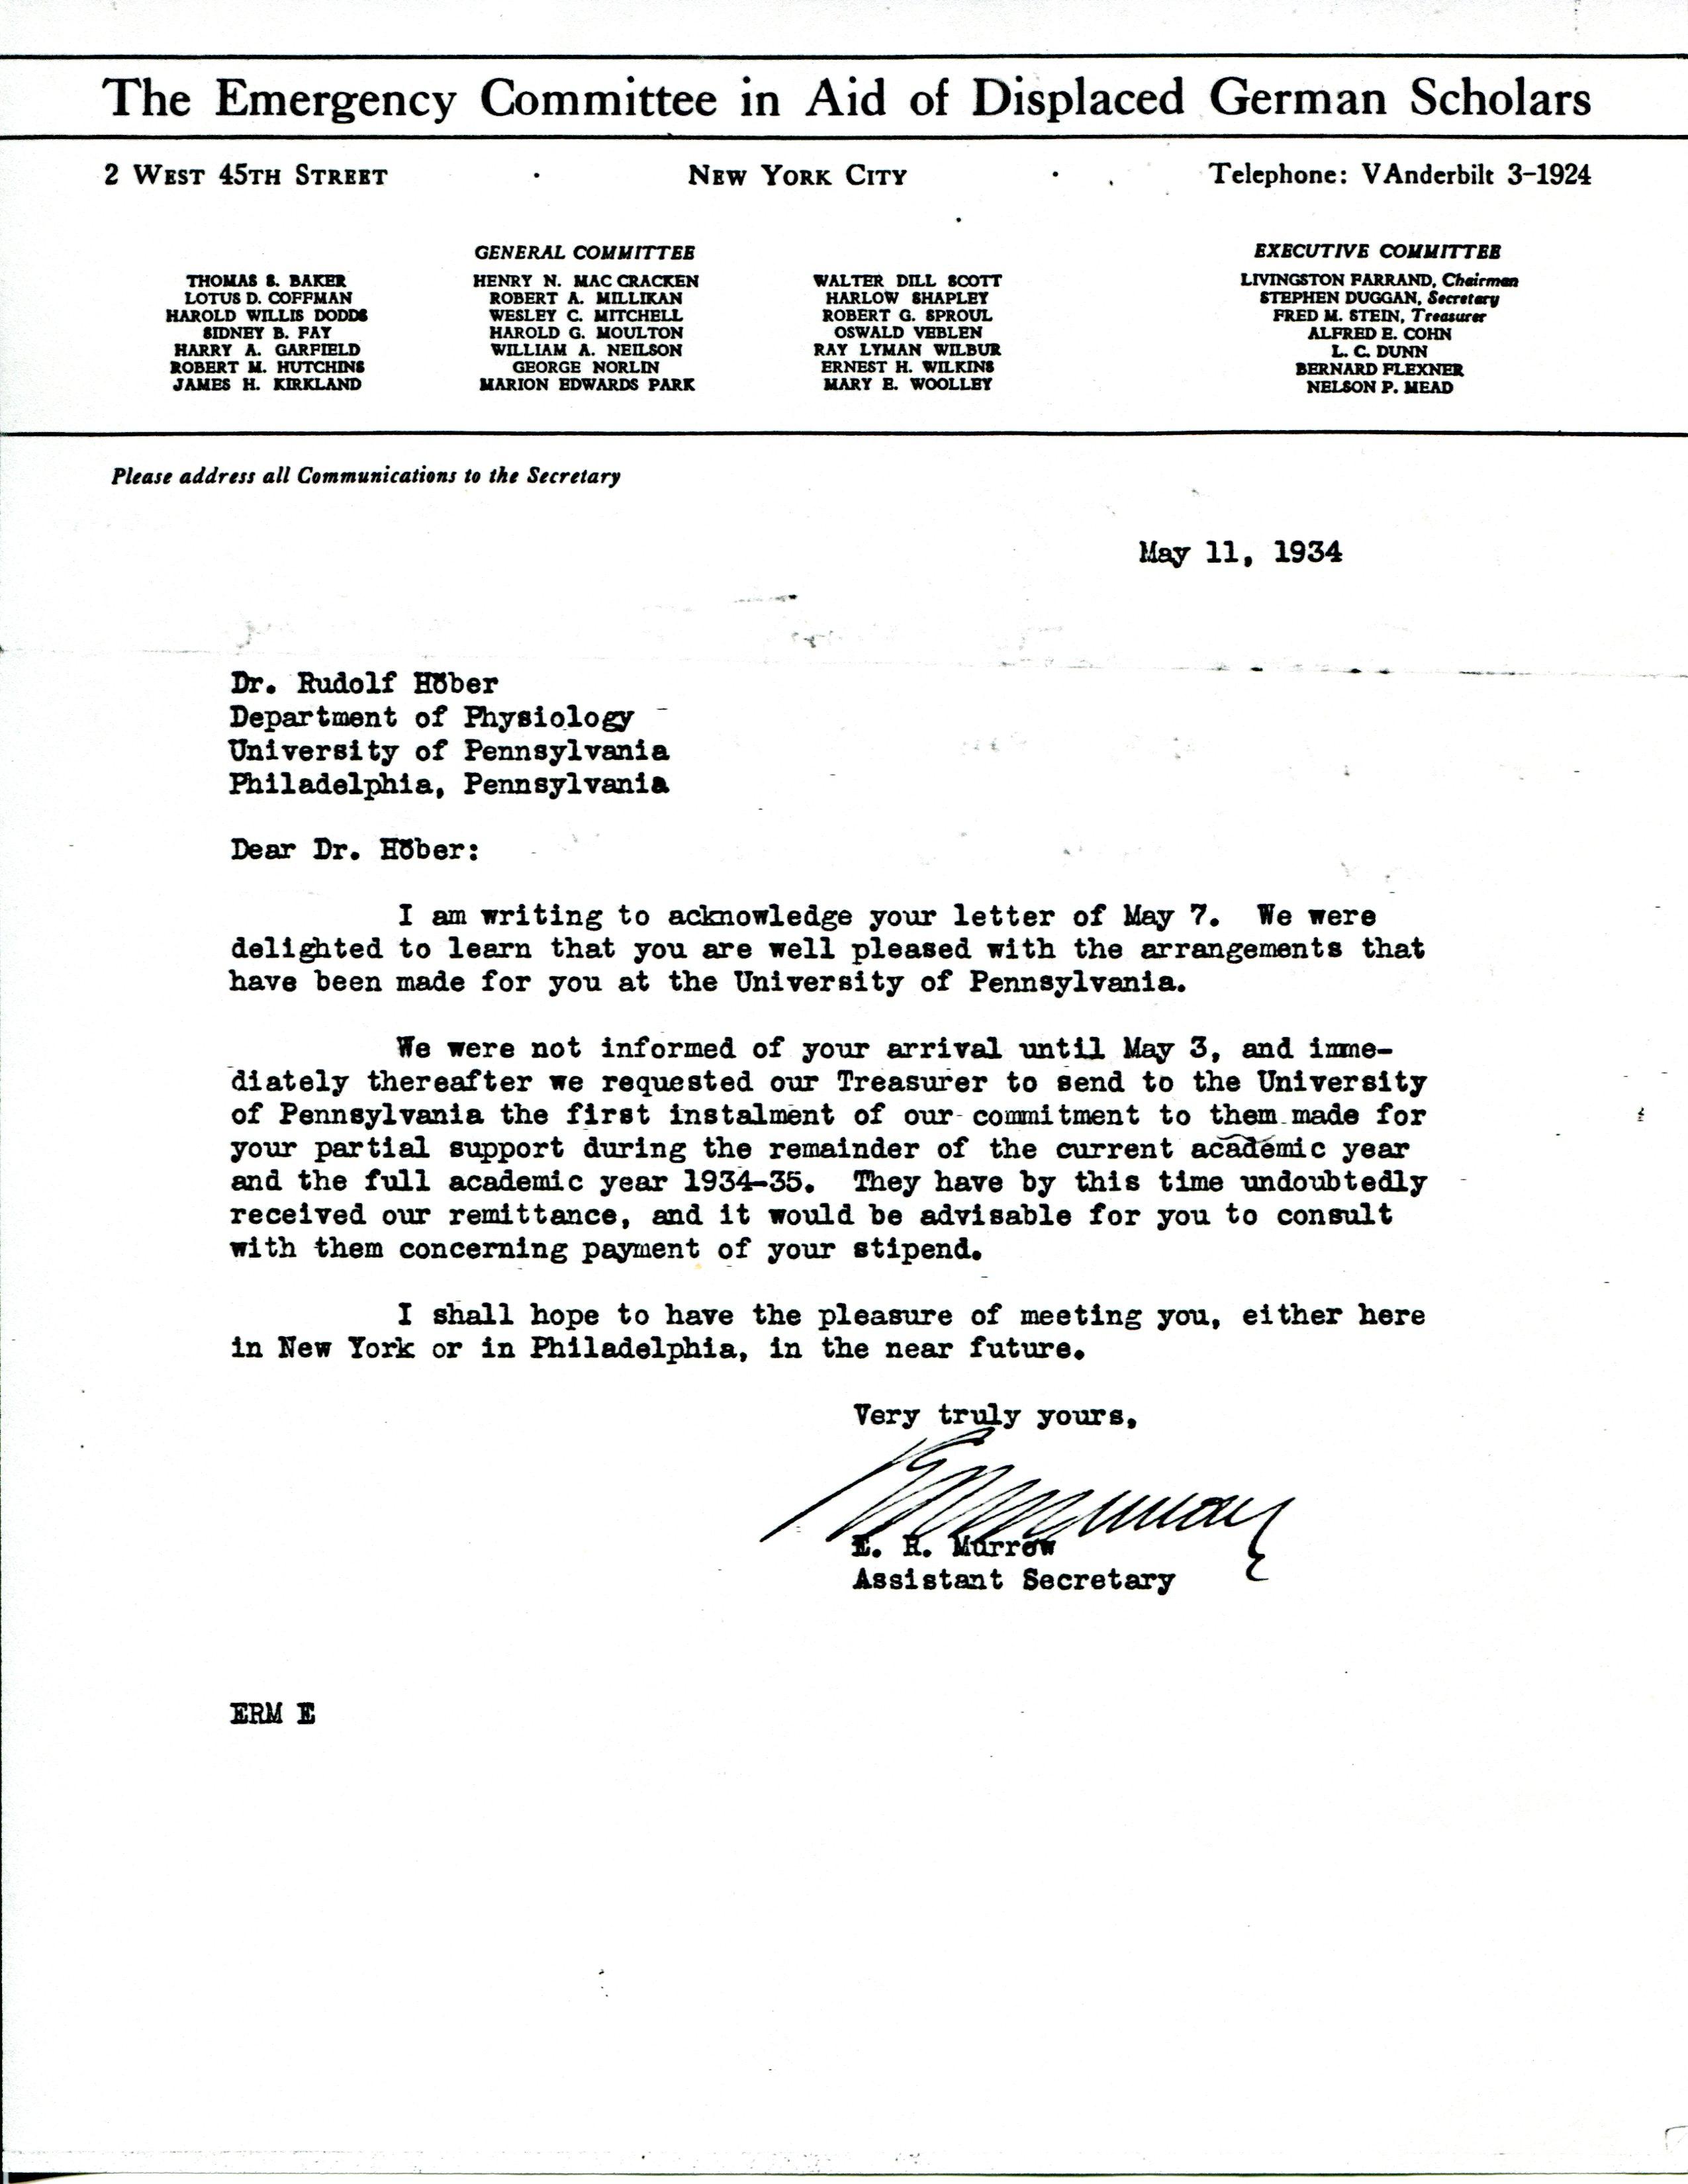 007 Cornell Essay Example Uofpenn Murrow Ltr May ~ Thatsnotus